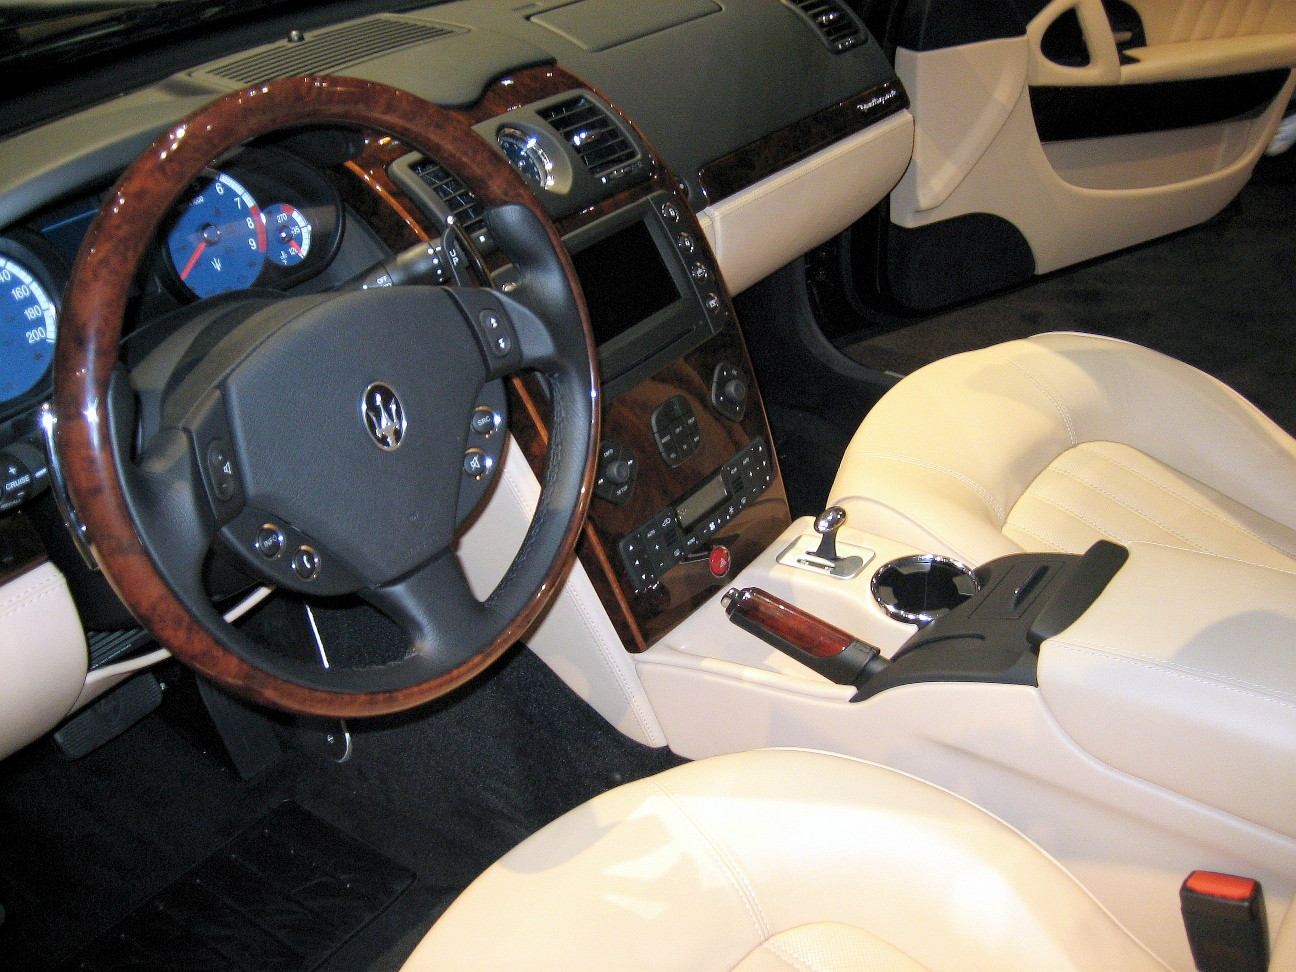 https://upload.wikimedia.org/wikipedia/commons/8/84/Maserati_Quattroporte_Exec_GT_interior_at_2006_Chicago_Auto_Show.jpg